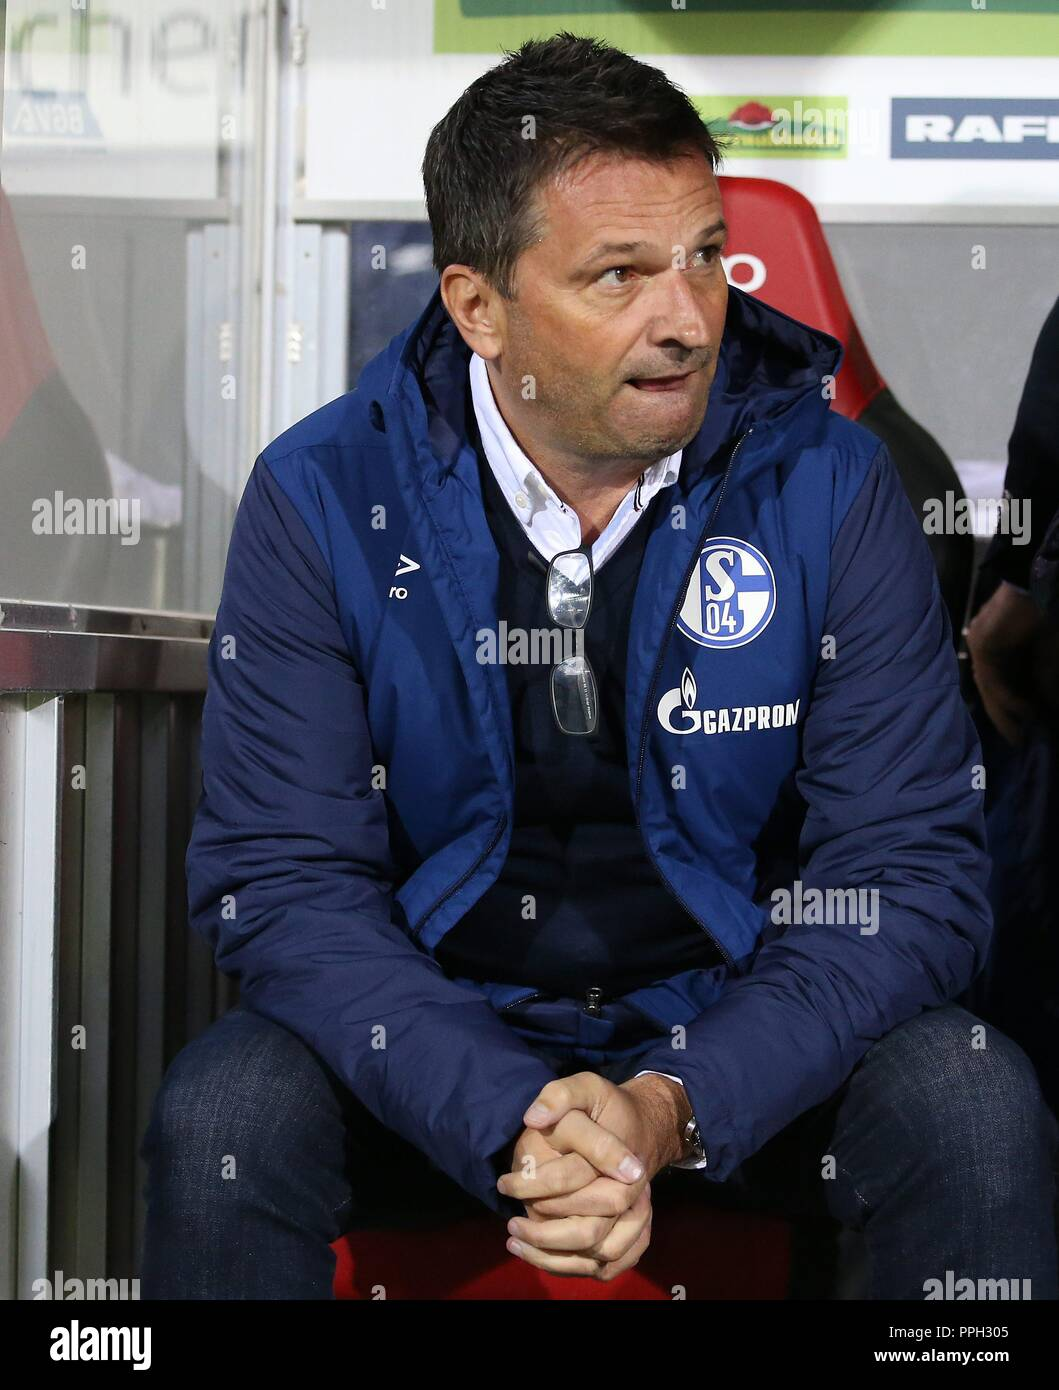 firo: 25.09.2018 Football, Football: 1. Bundesliga, Season 2018/2019 SC Freiburg - S04 FC Schalke 04 S04 Manager, Management, Christian Heidel,   usage worldwide - Stock Image